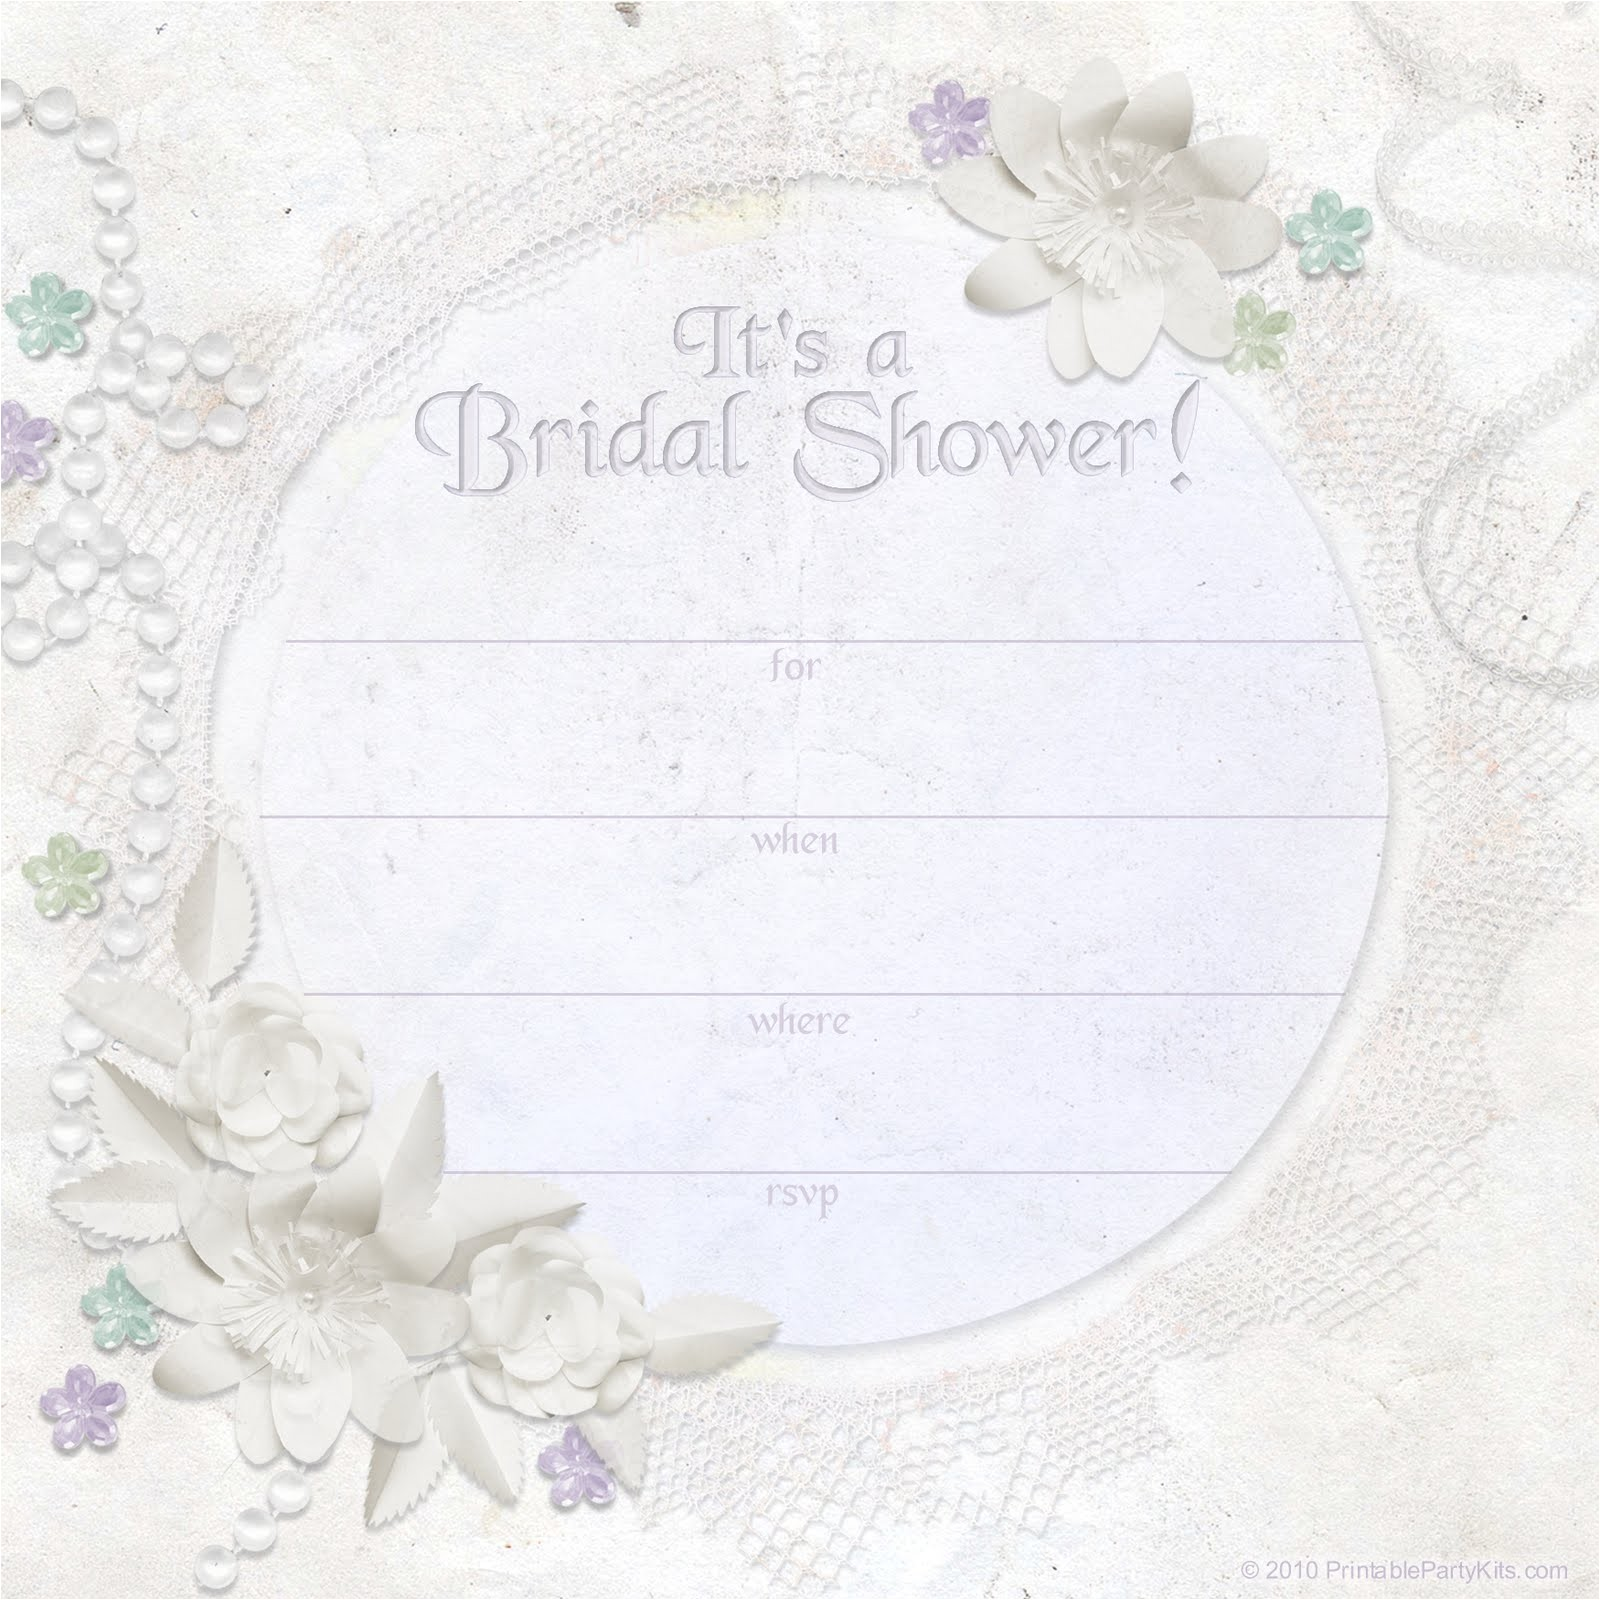 Free Bridal Shower Invitation Free Printable Party Invitations Ivory Dreams Bridal